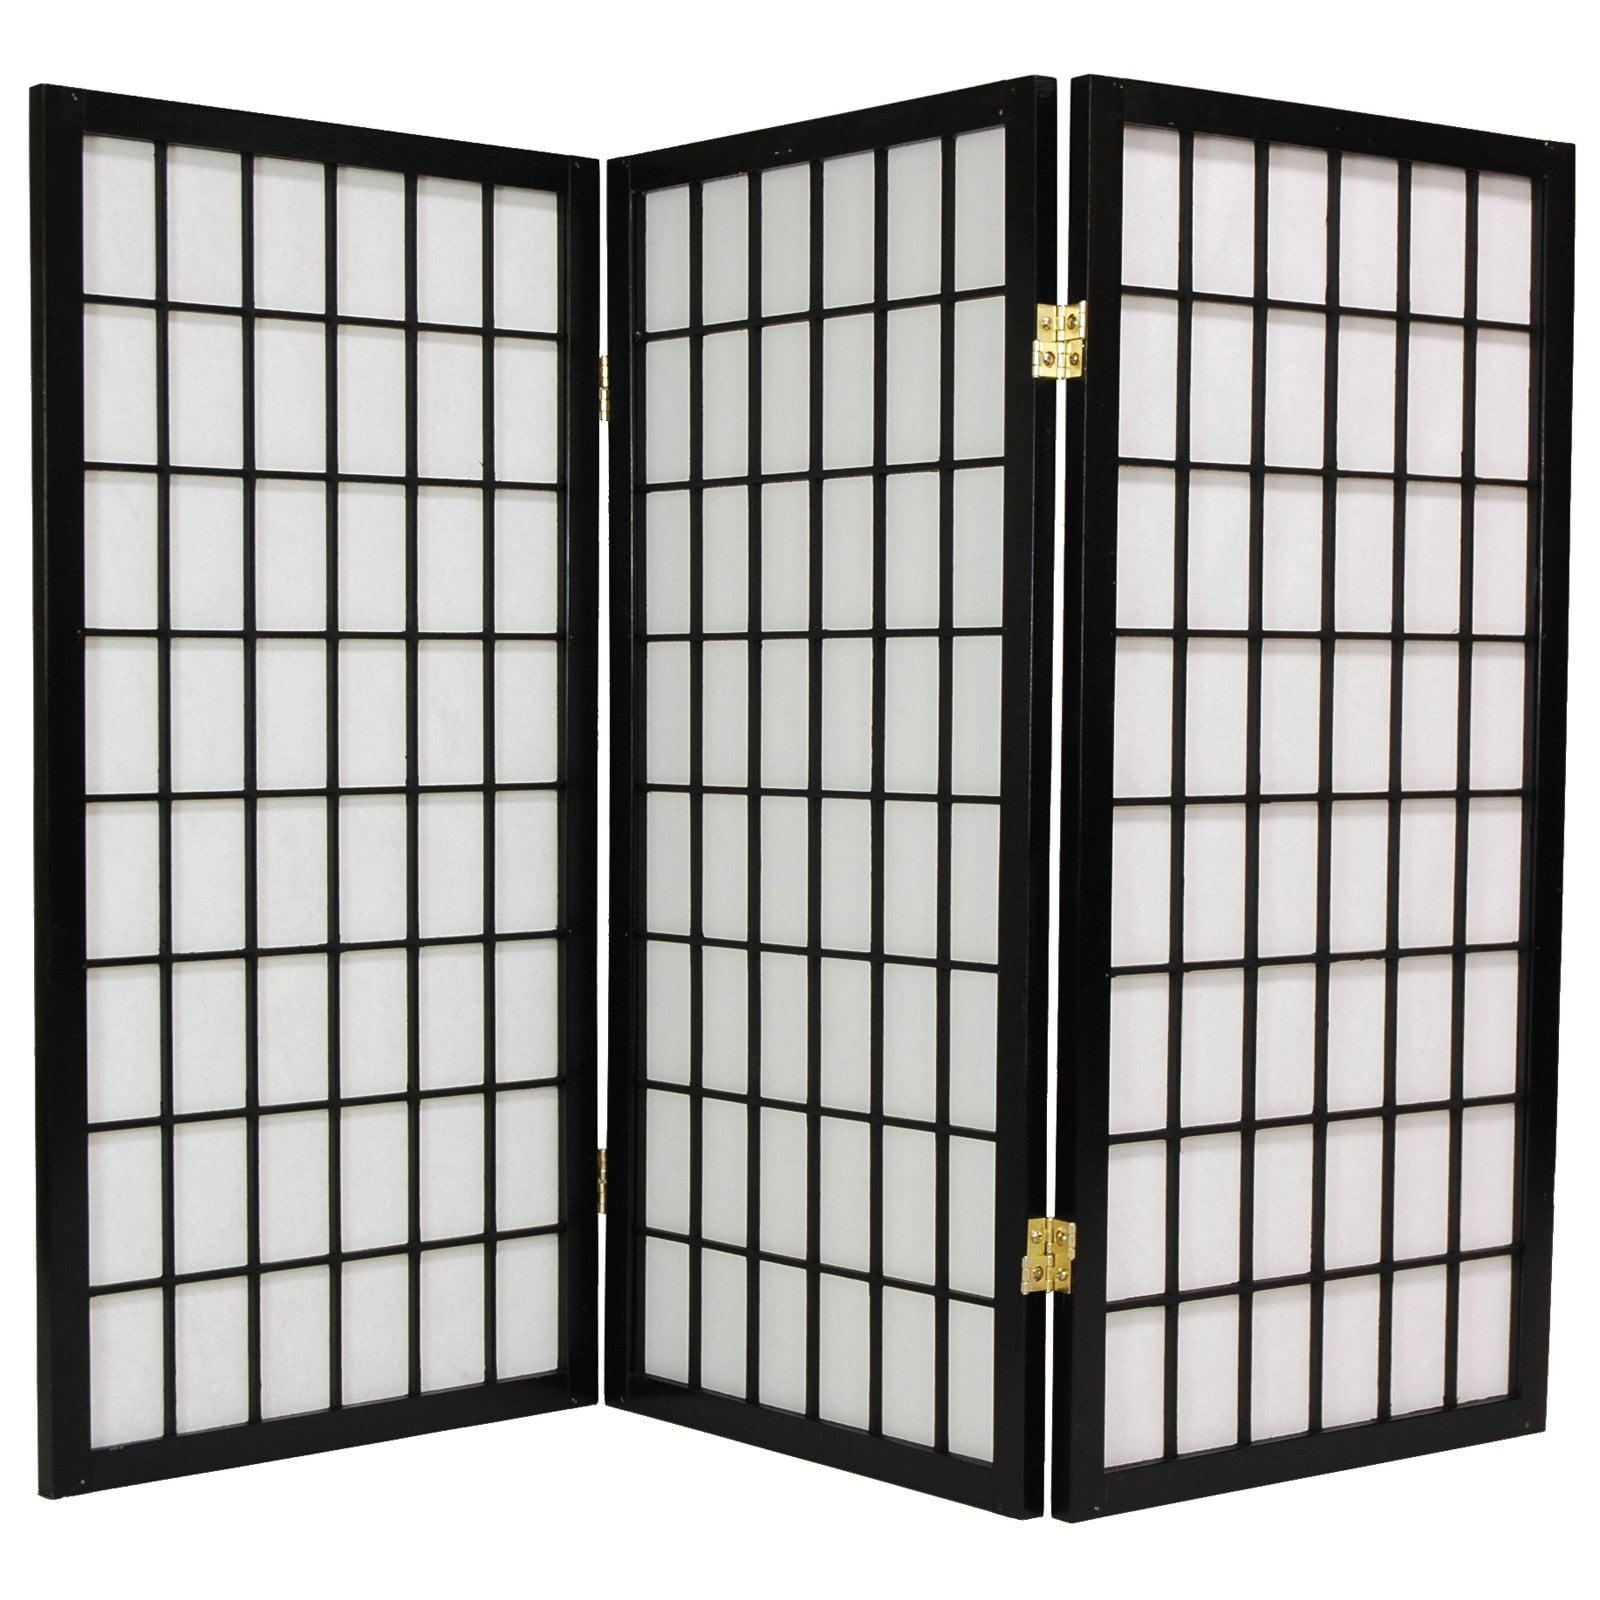 Oriental Furniture Window Pane 36 Inch Tall Shoji Room Divider